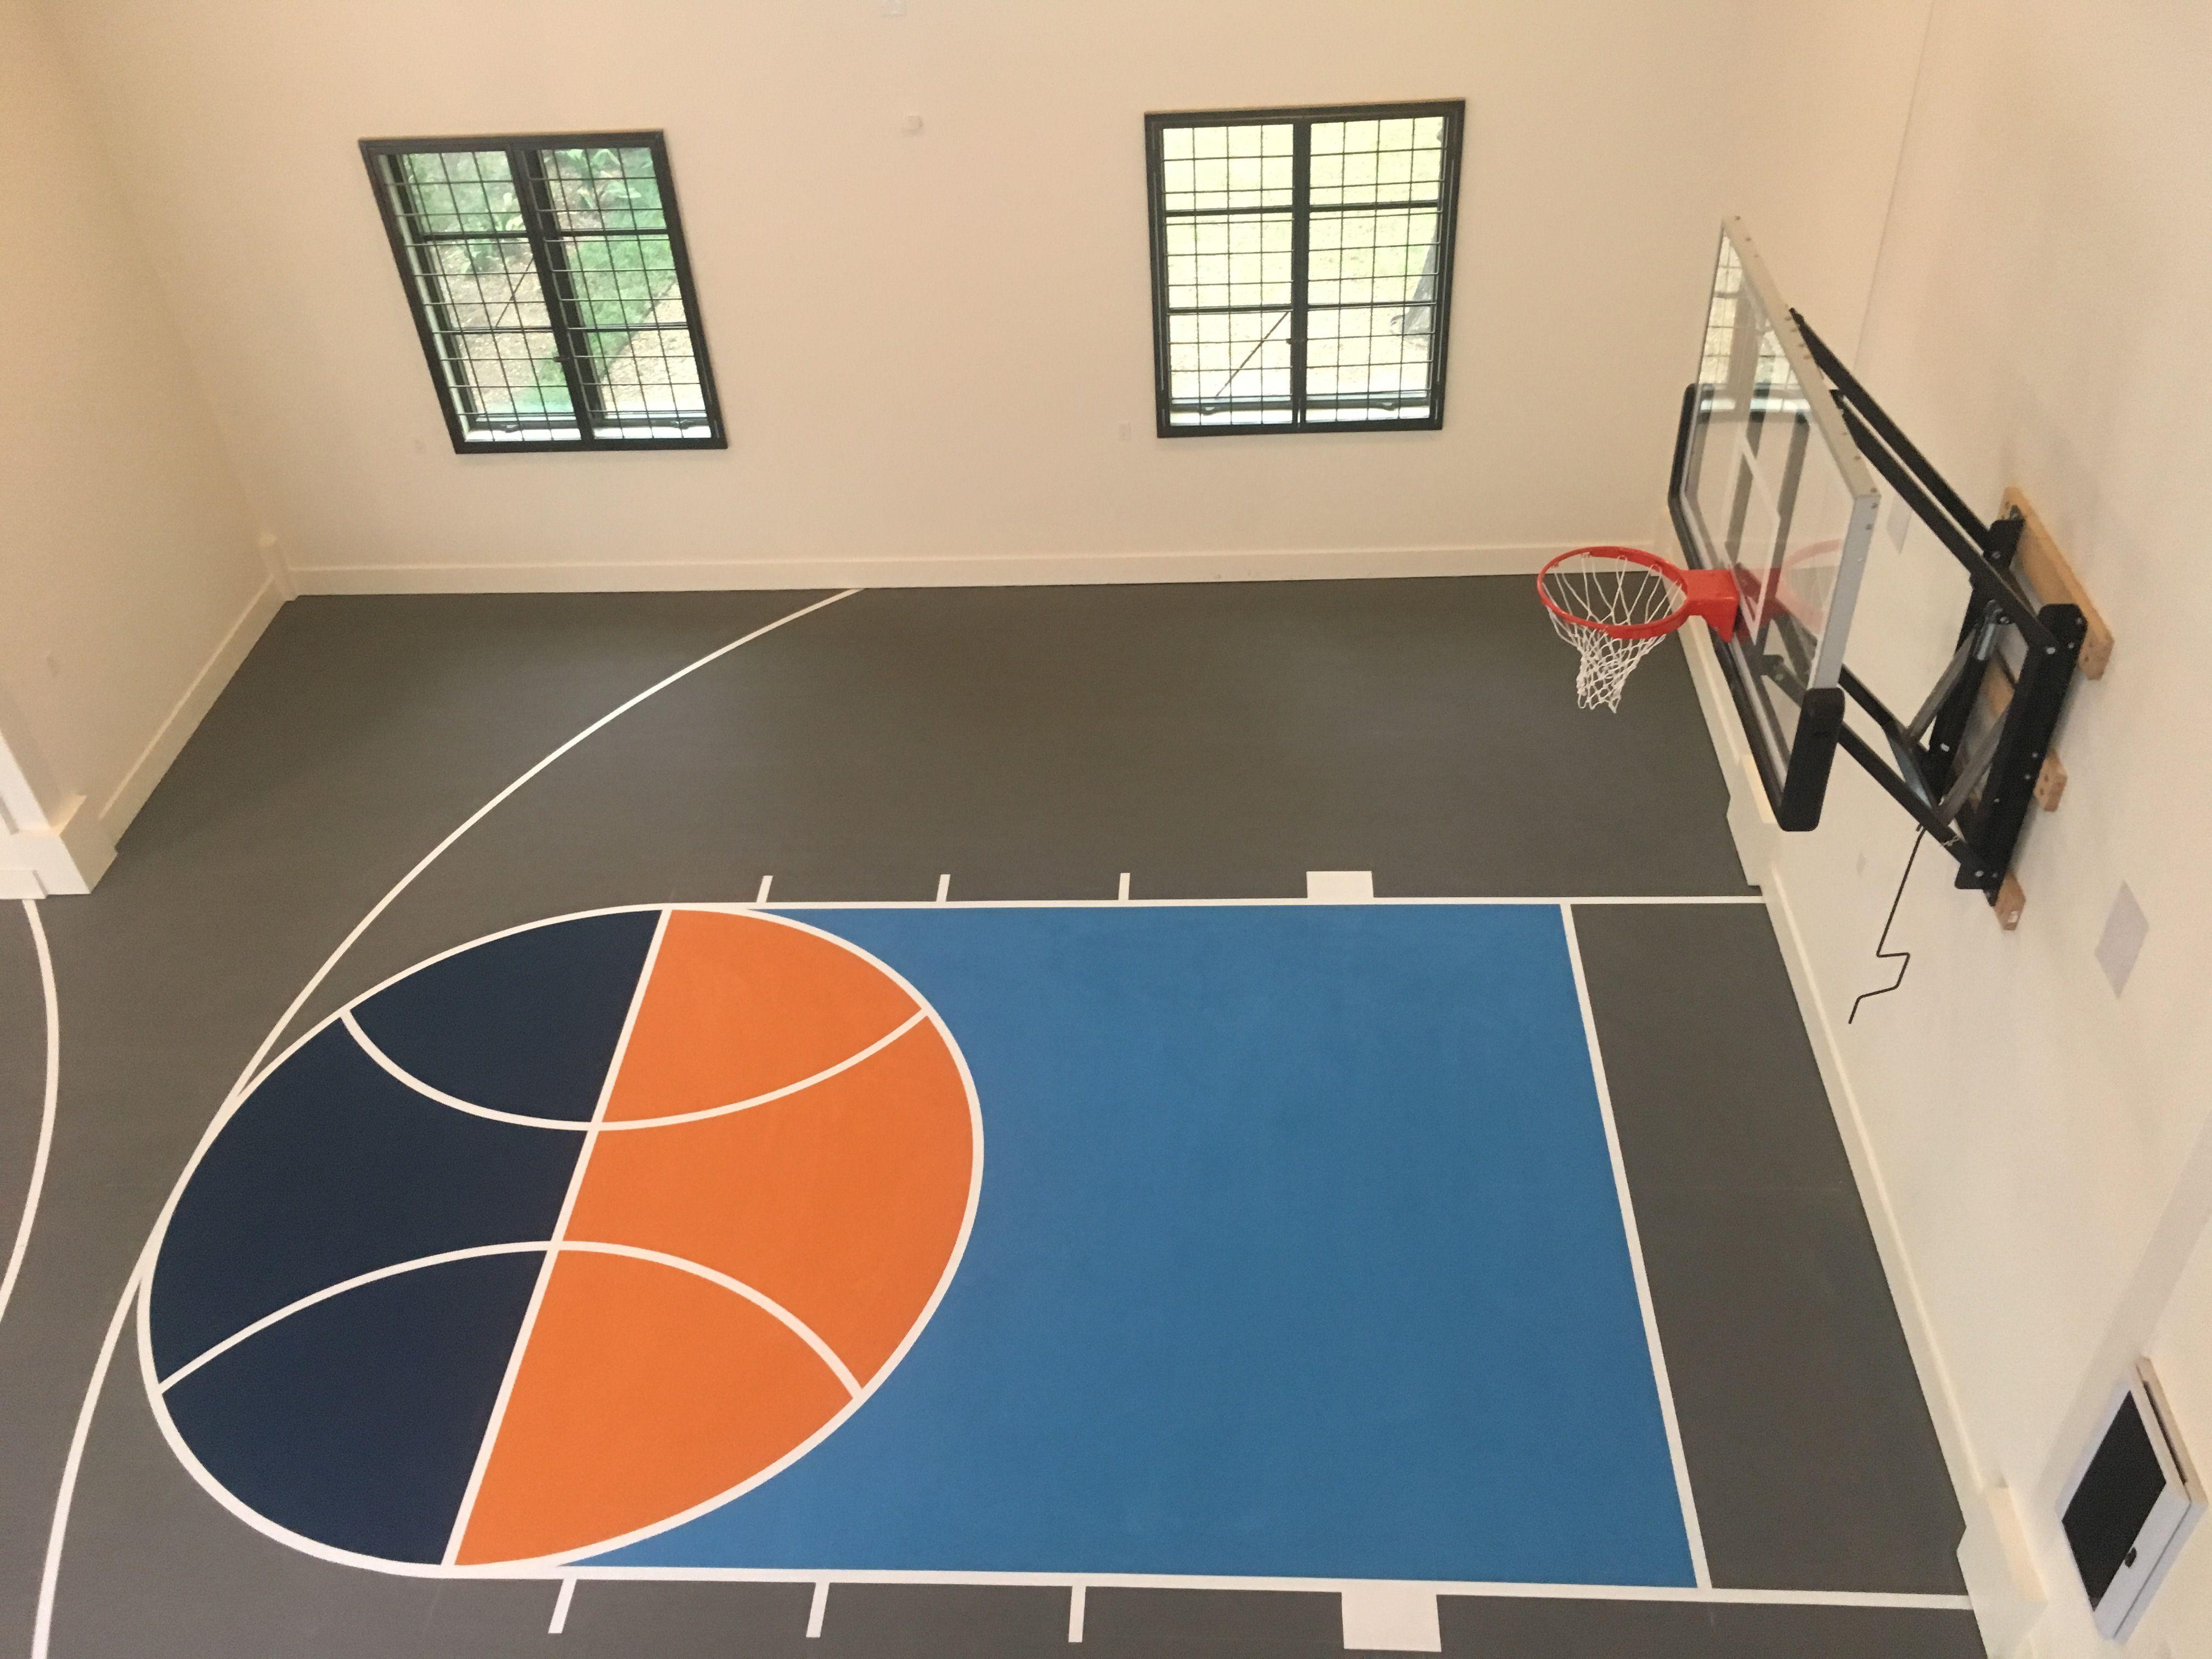 First Team S Wallmonster Arena Adjustable Wall Mount Basketball Hoop Basketball Goals Basketball Basketball Tips